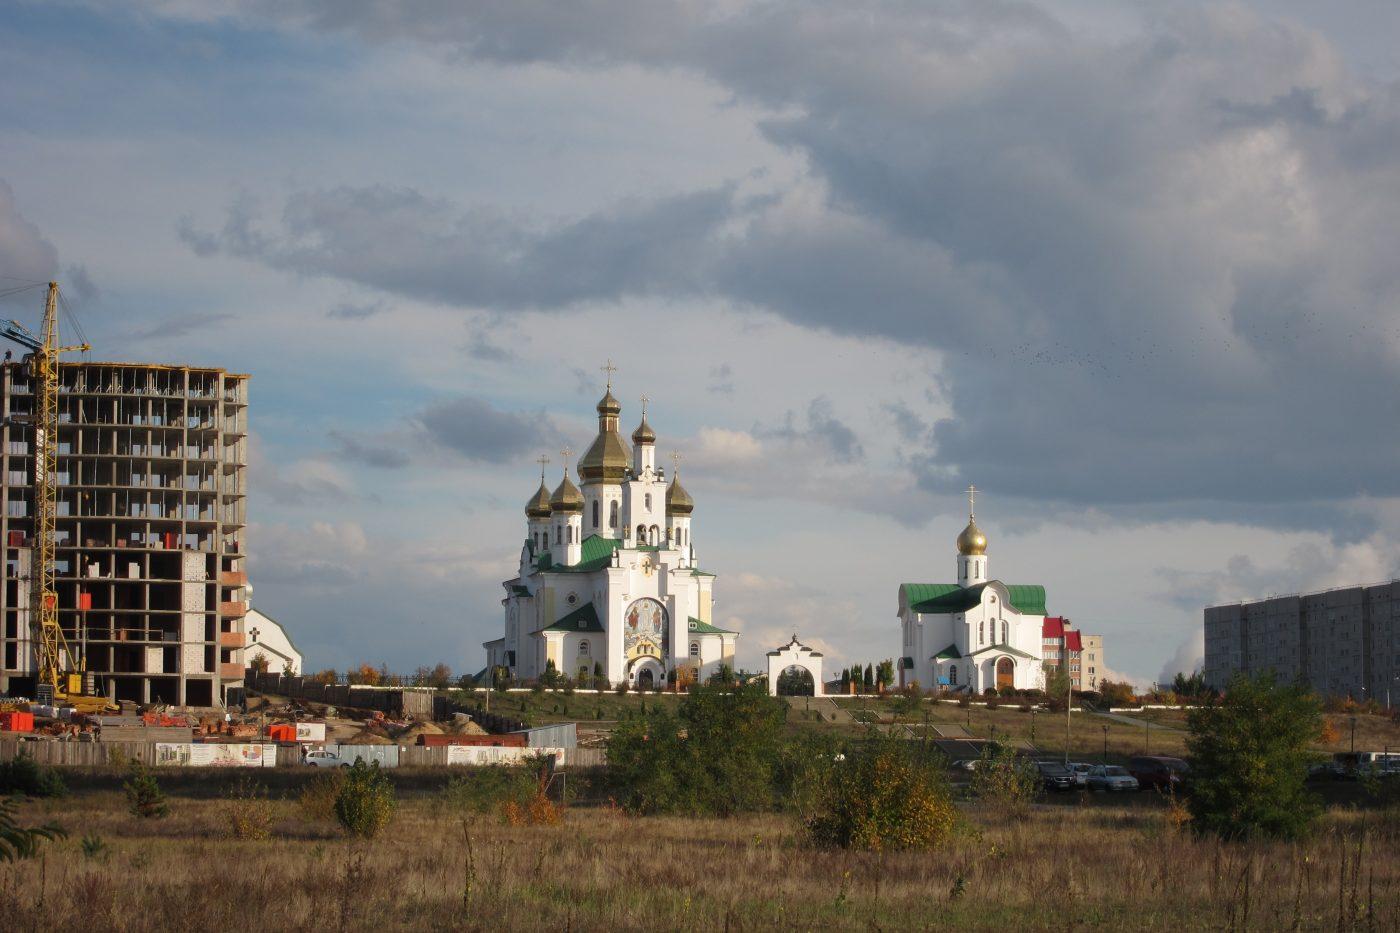 Reise durch Polesiens Atomstädte 1, Foto: Svetlana Boltovskaja